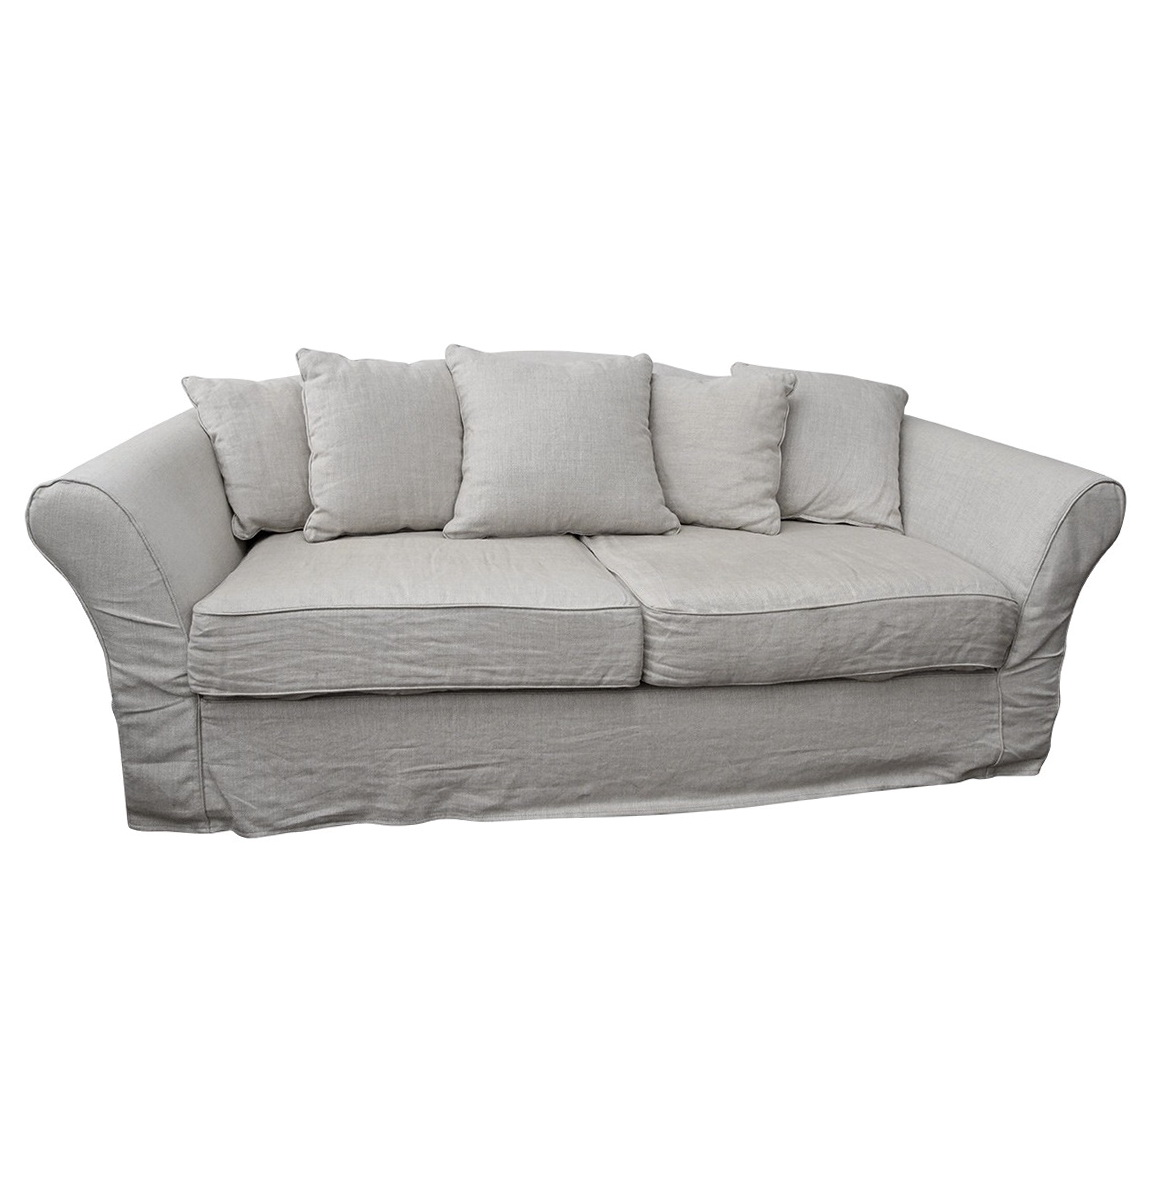 Restoration Hardware Sofa Slipcovers